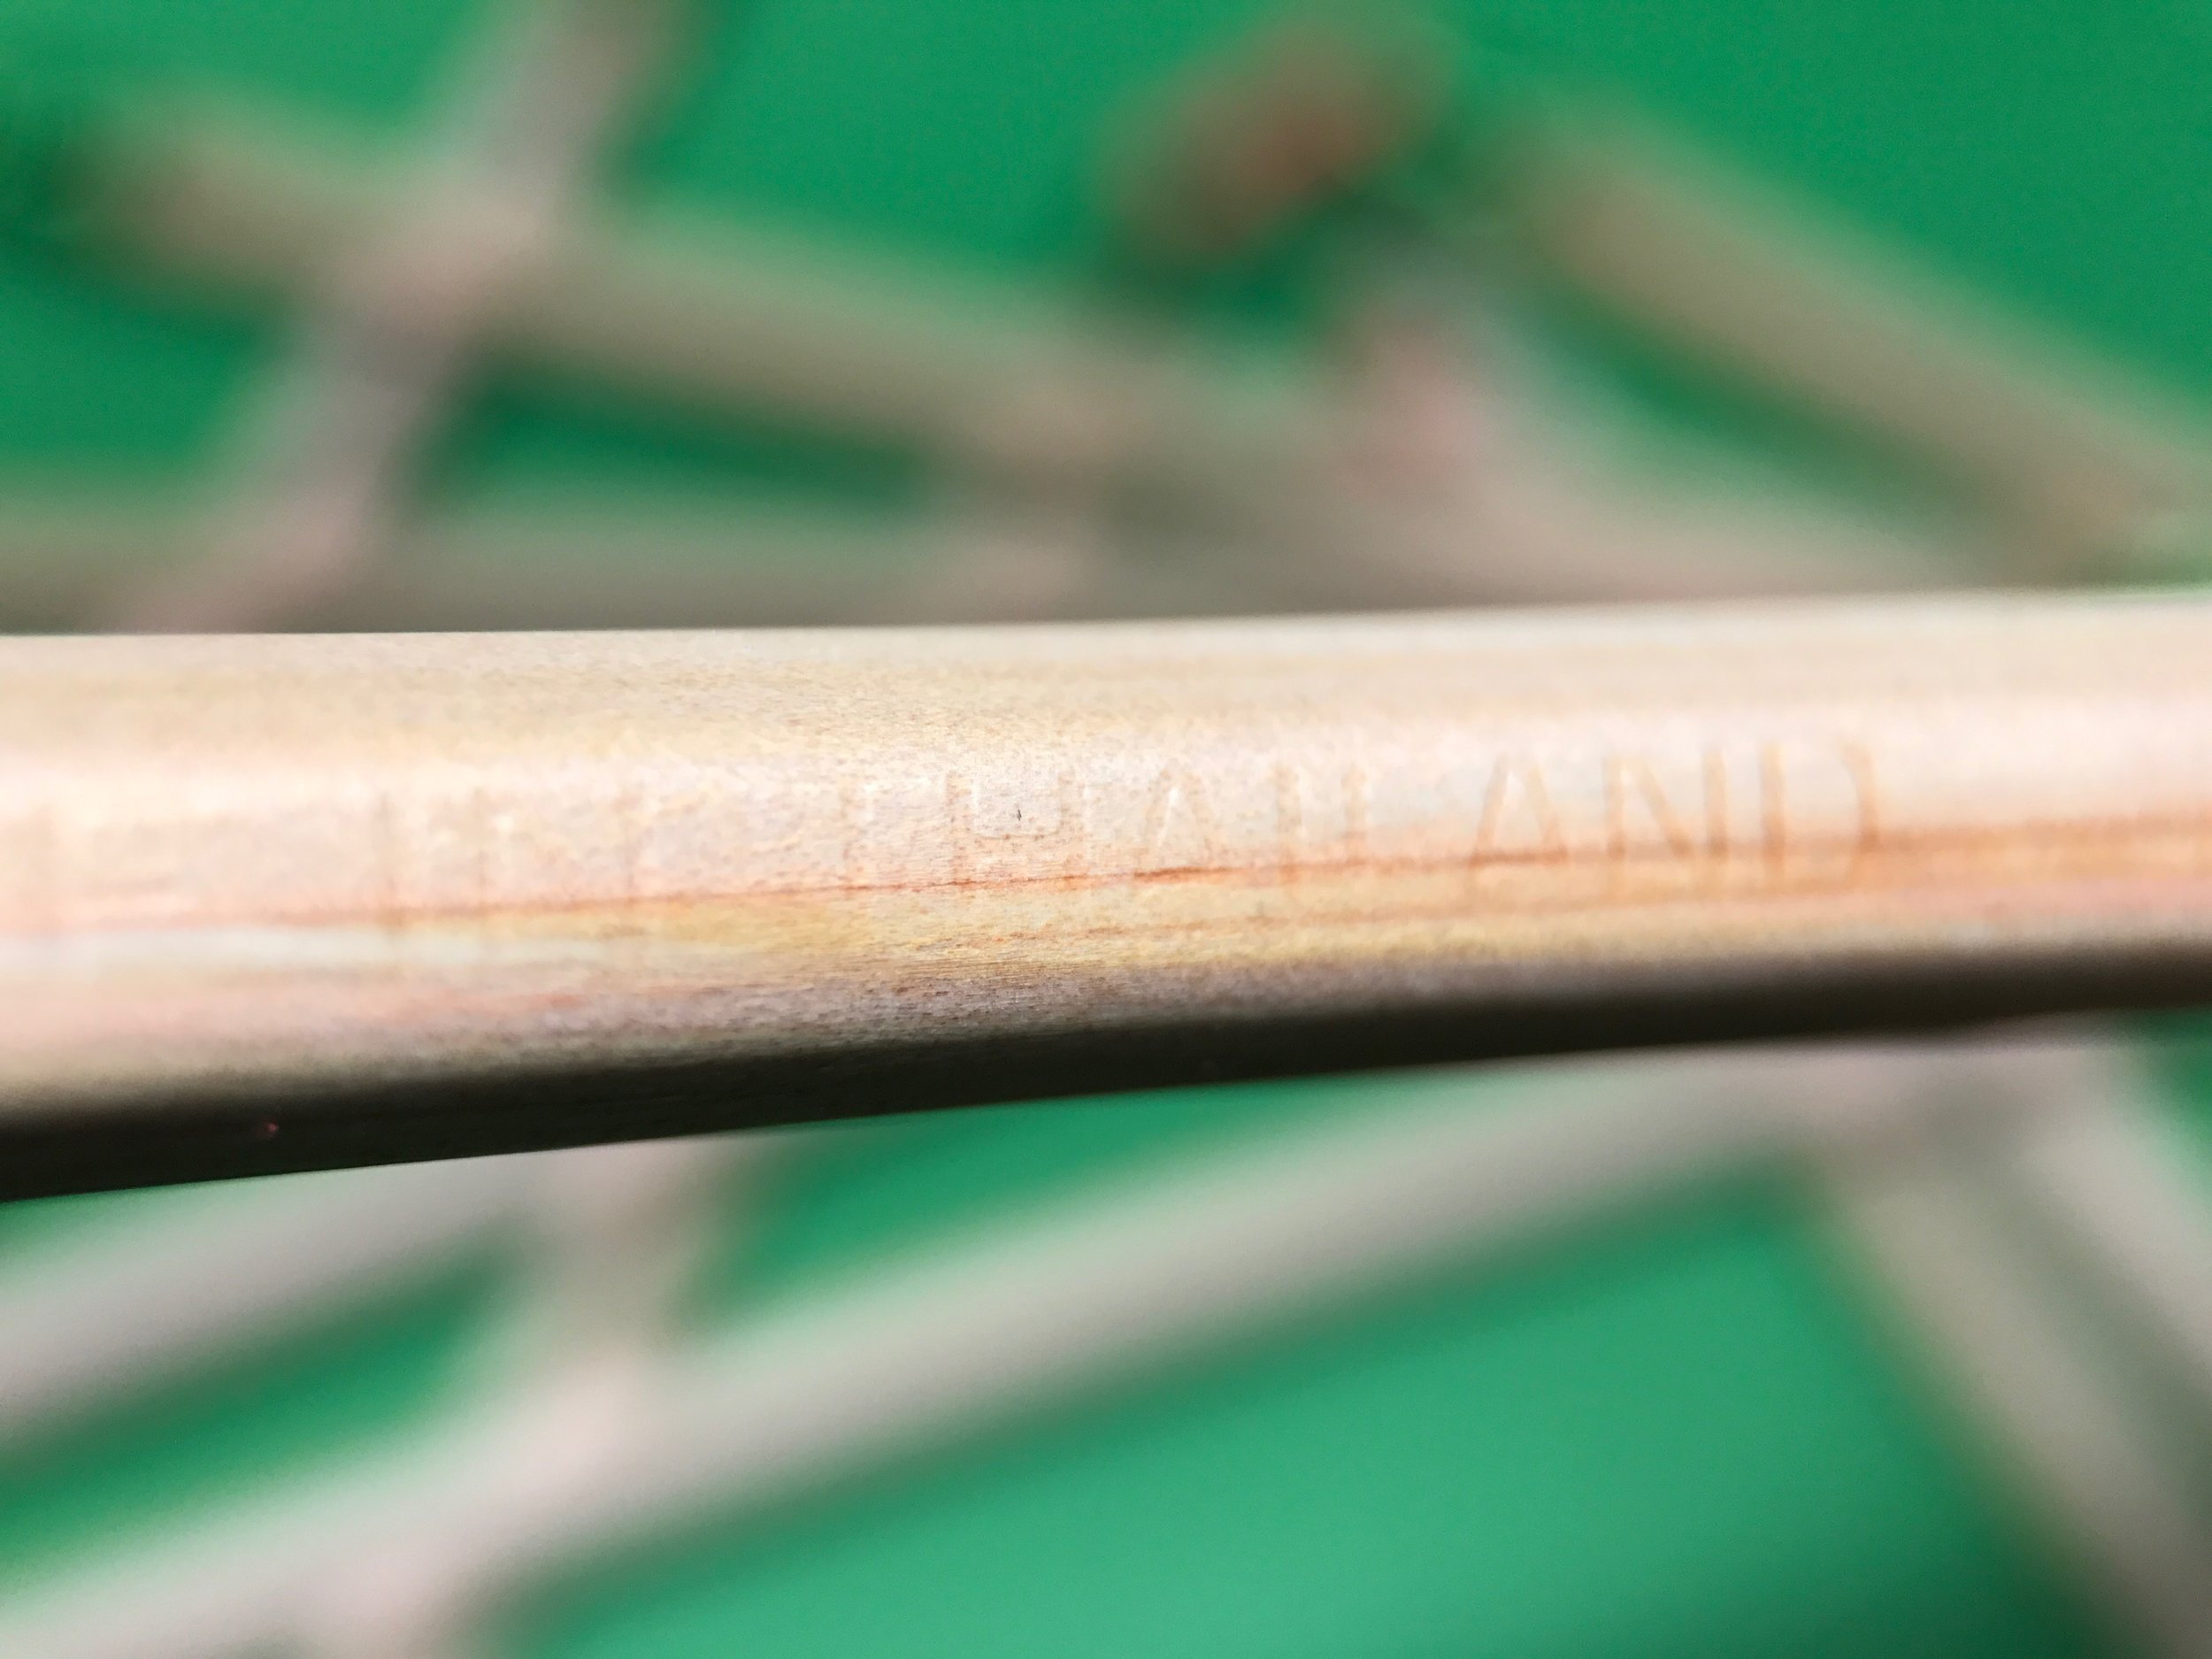 palomino-forest-choice-pencil-11.jpg